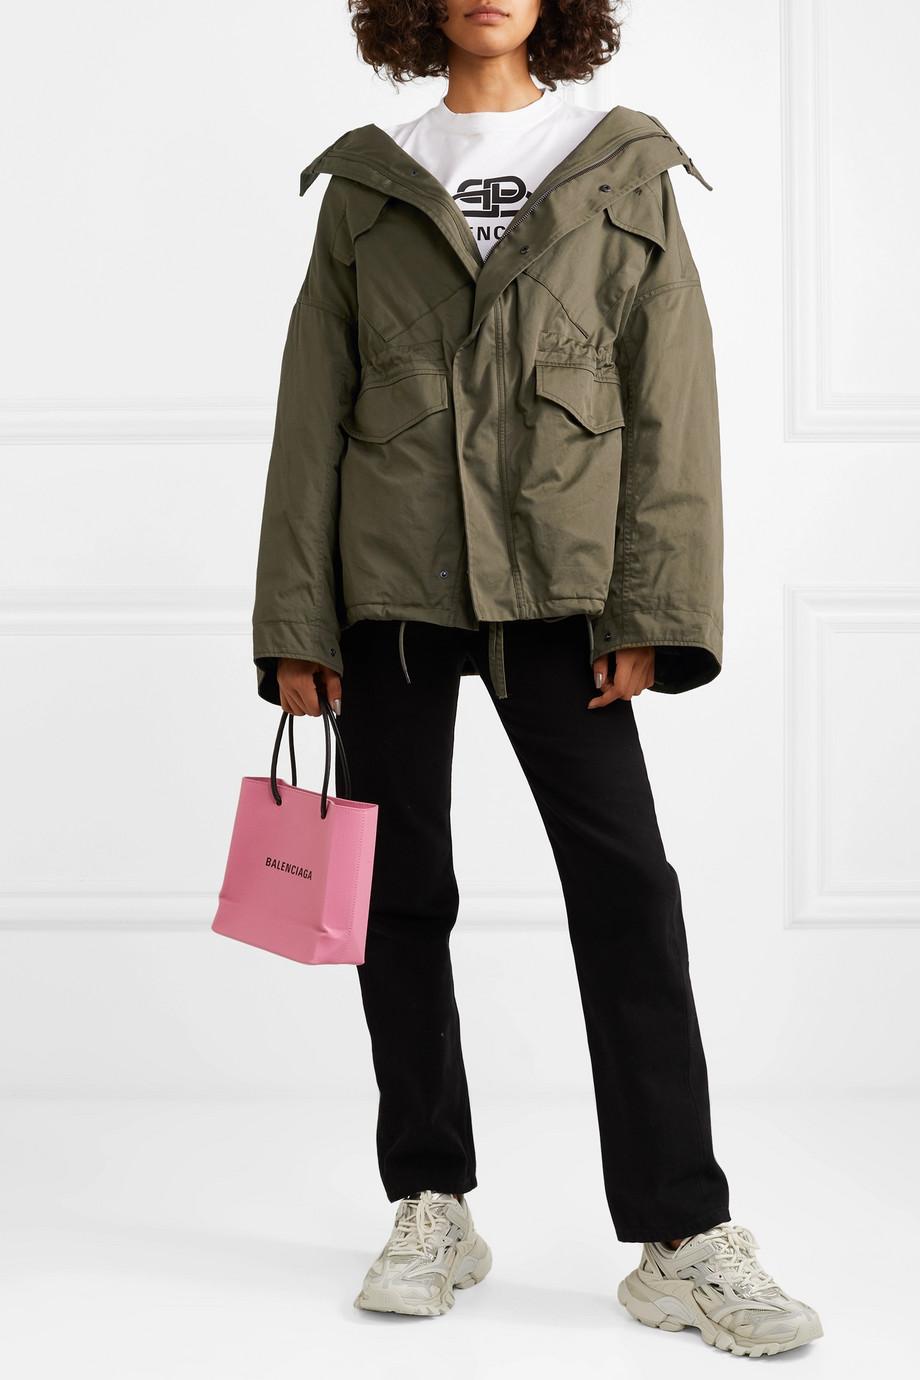 Balenciaga Swing oversized hooded cotton-twill jacket